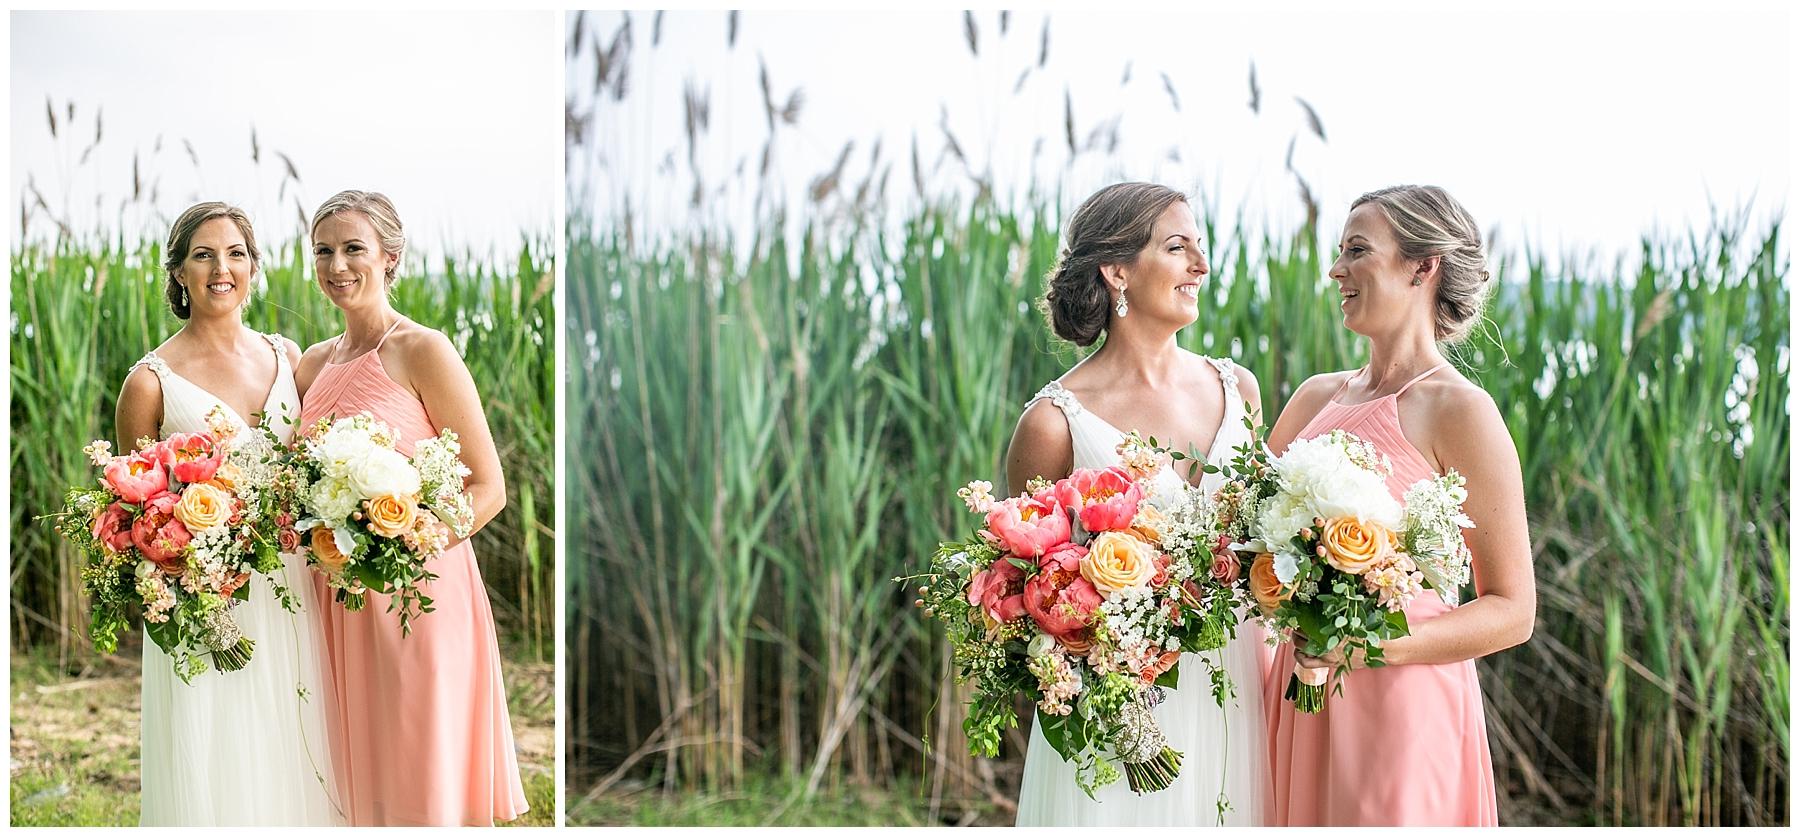 Chelsea Phil Bohemia River Overlook Wedding Living Radiant Photography photos_0067.jpg